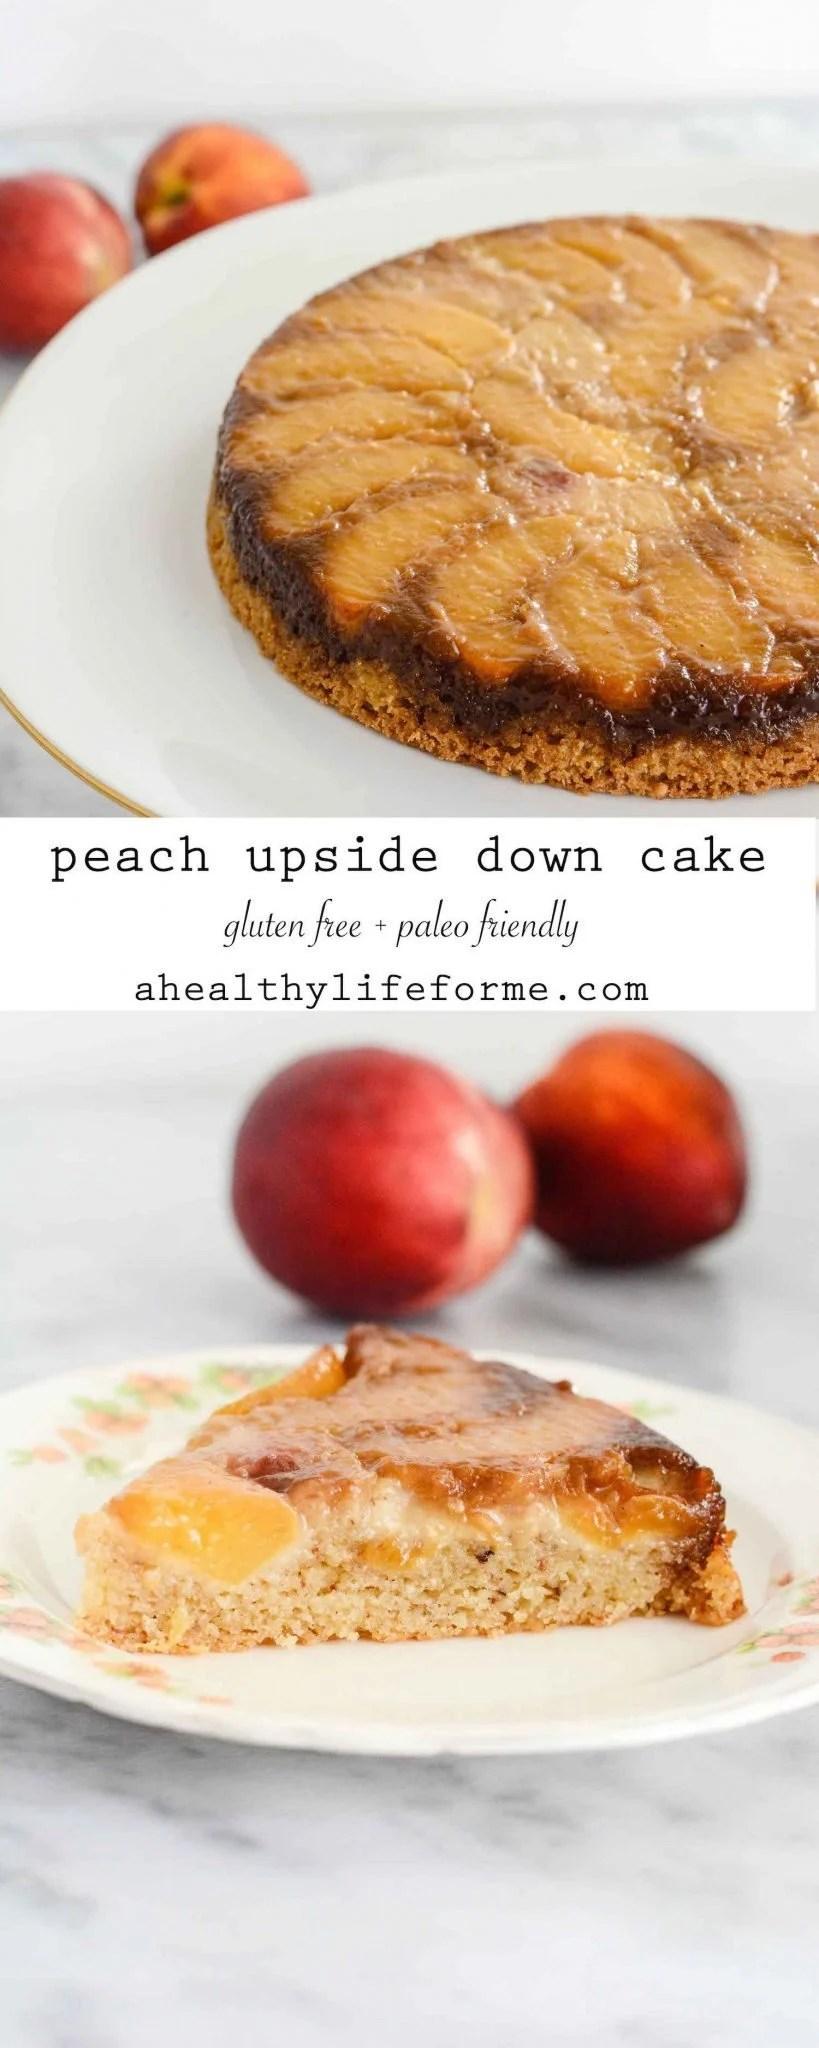 Upside Down Blueberry Cake Paleo